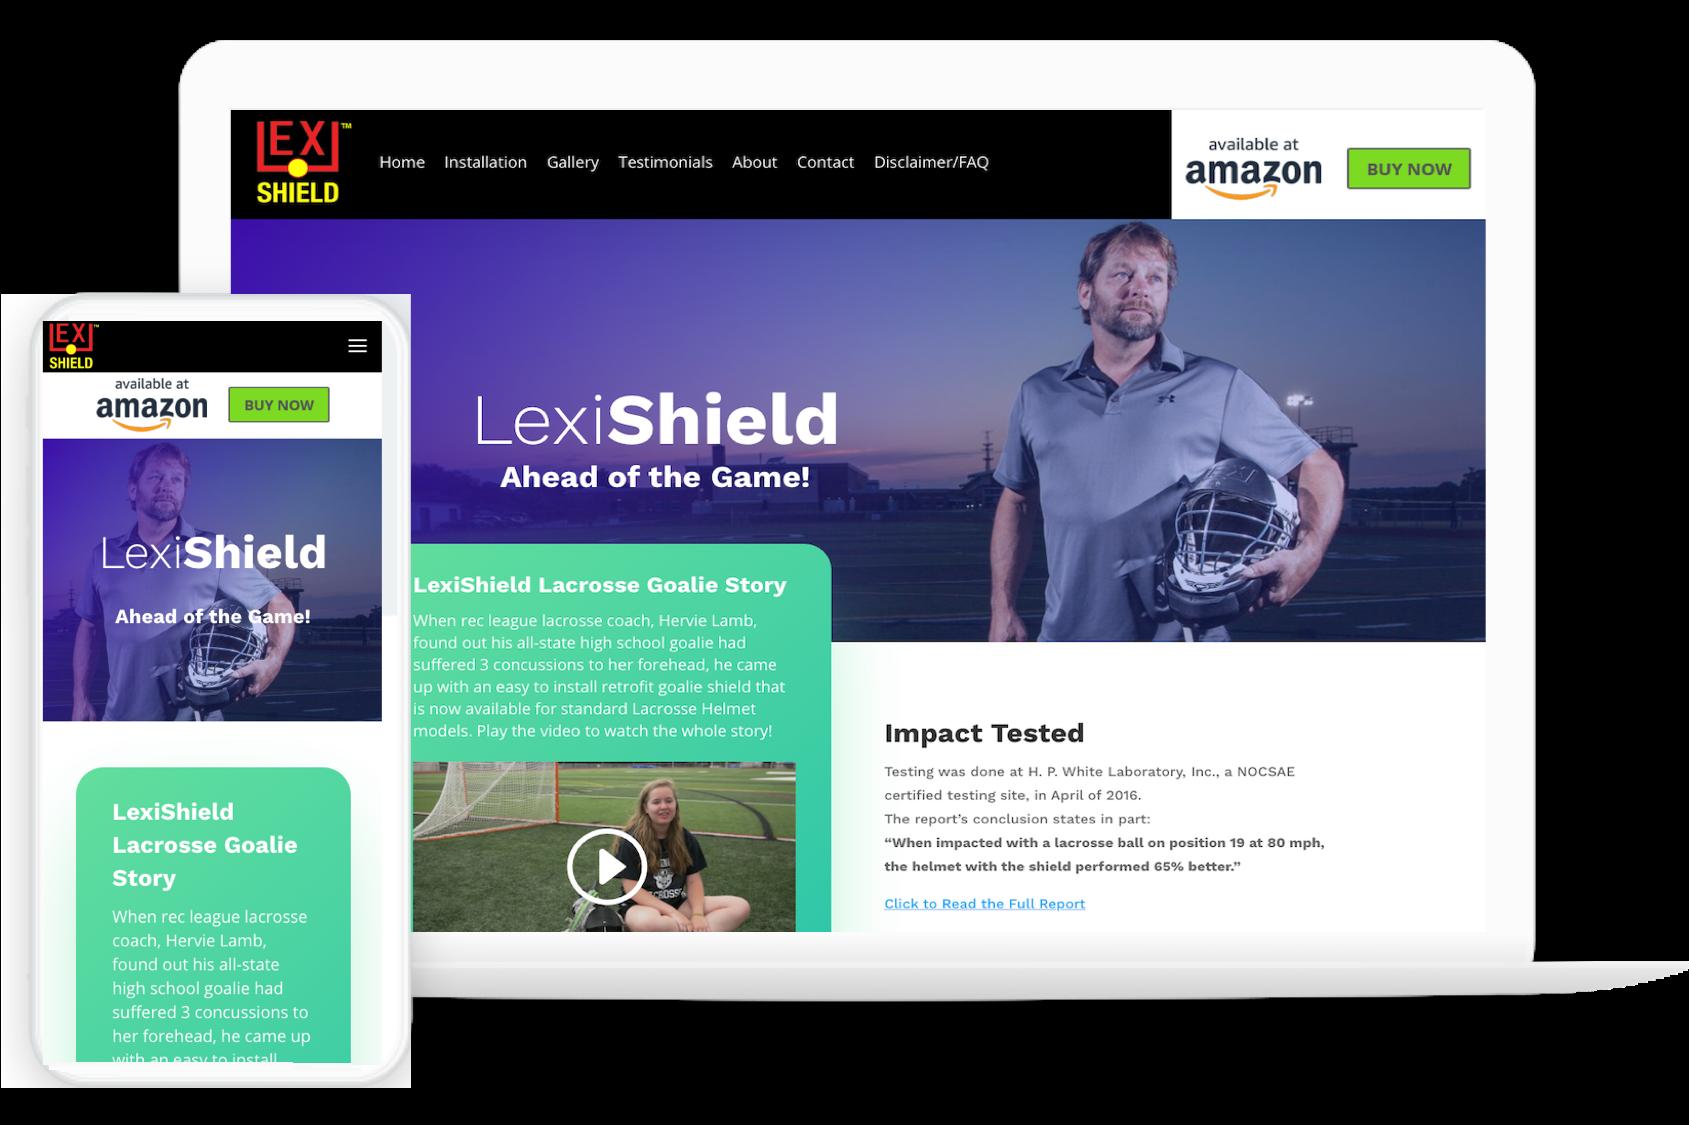 Lexishield